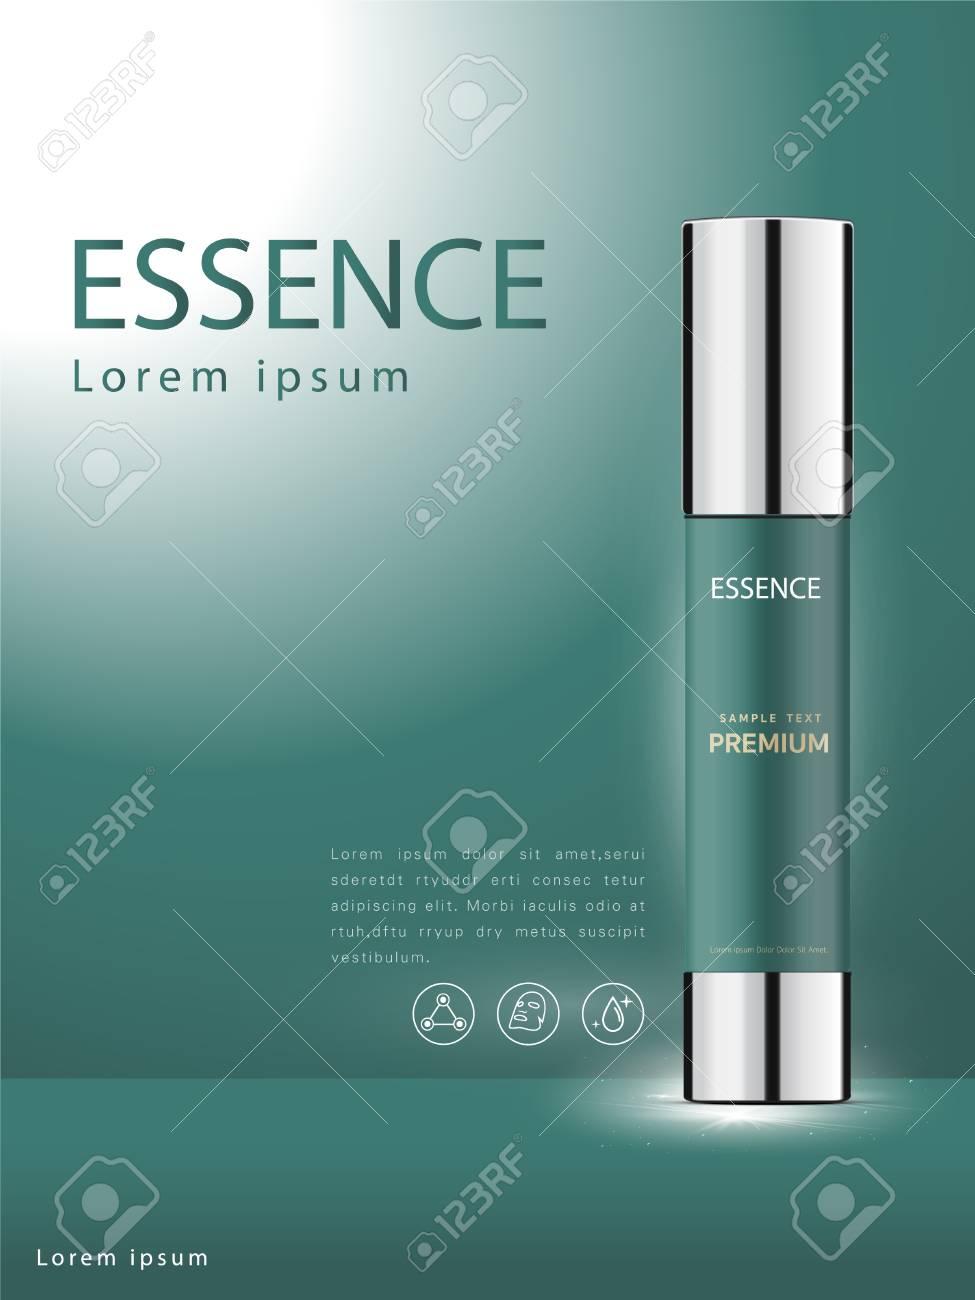 Facial Treatment Essence Skin Care Cosmetic beautiful vector - 109626480